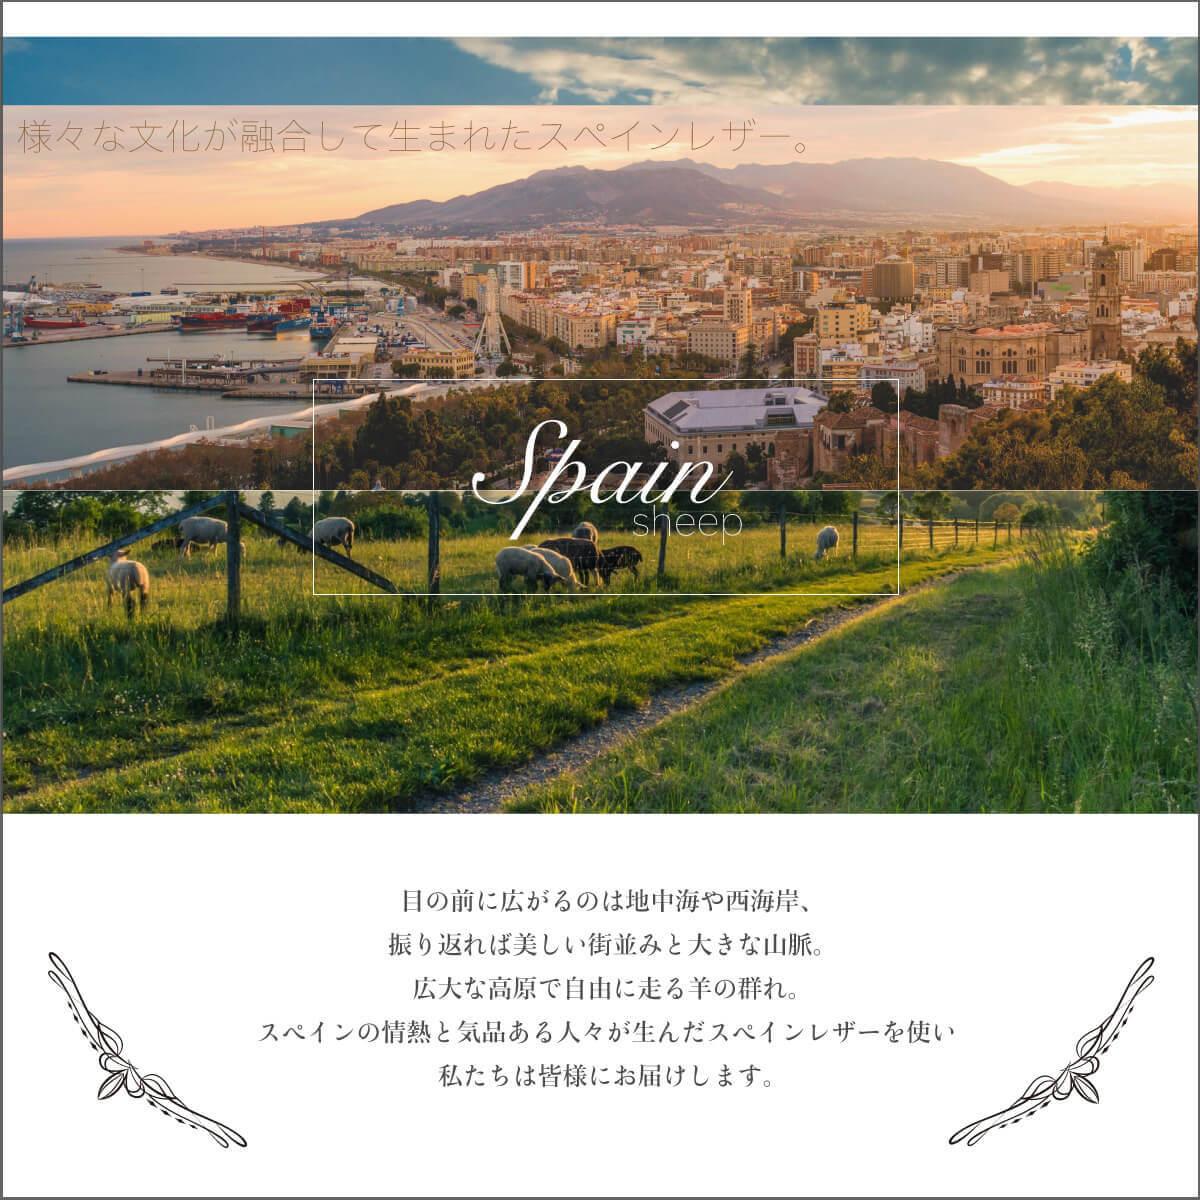 Polka スペインレザー ショートストラップ【ToocTooc】